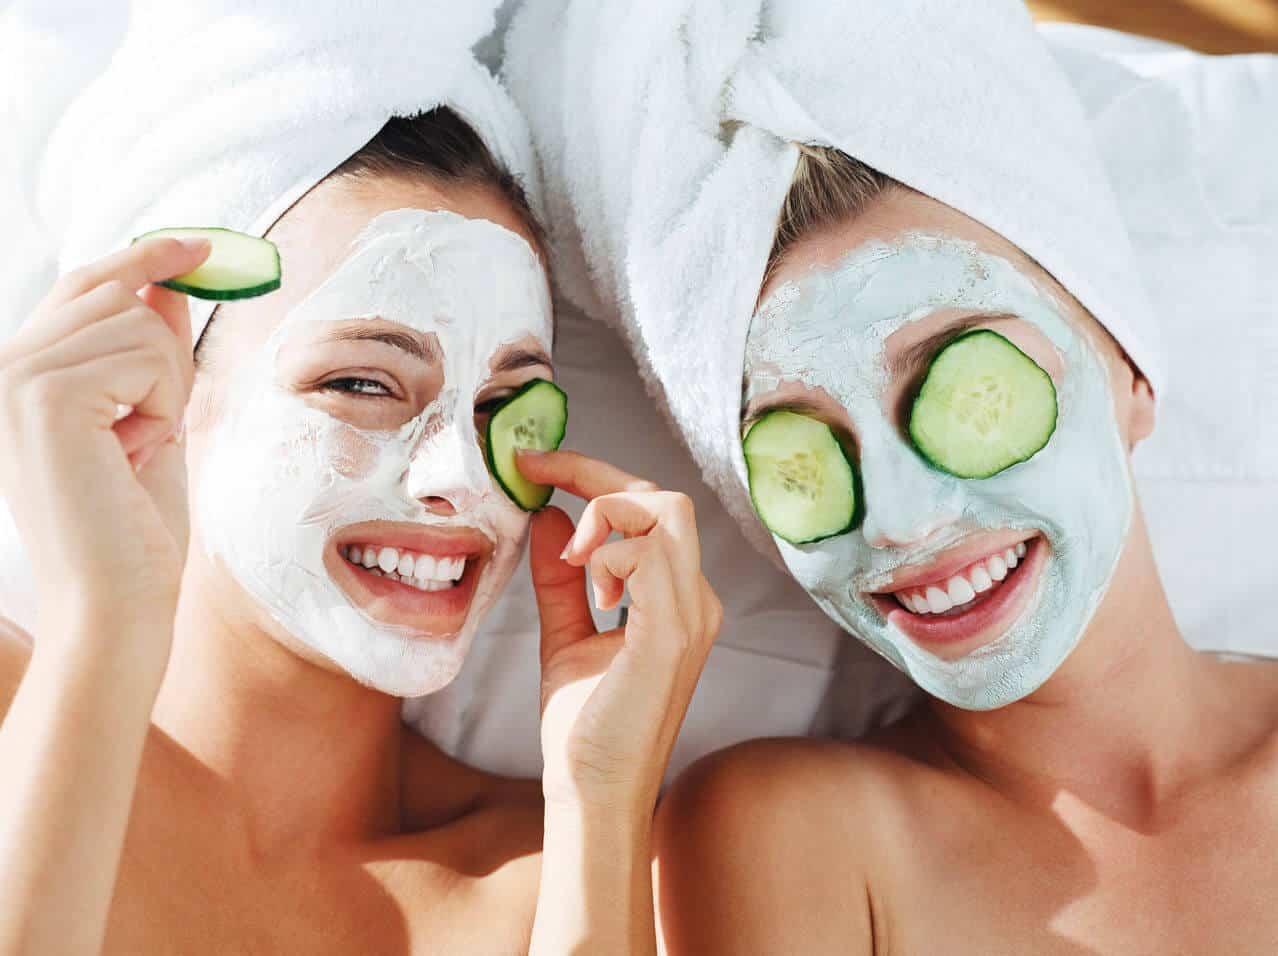 Cucumber face mask